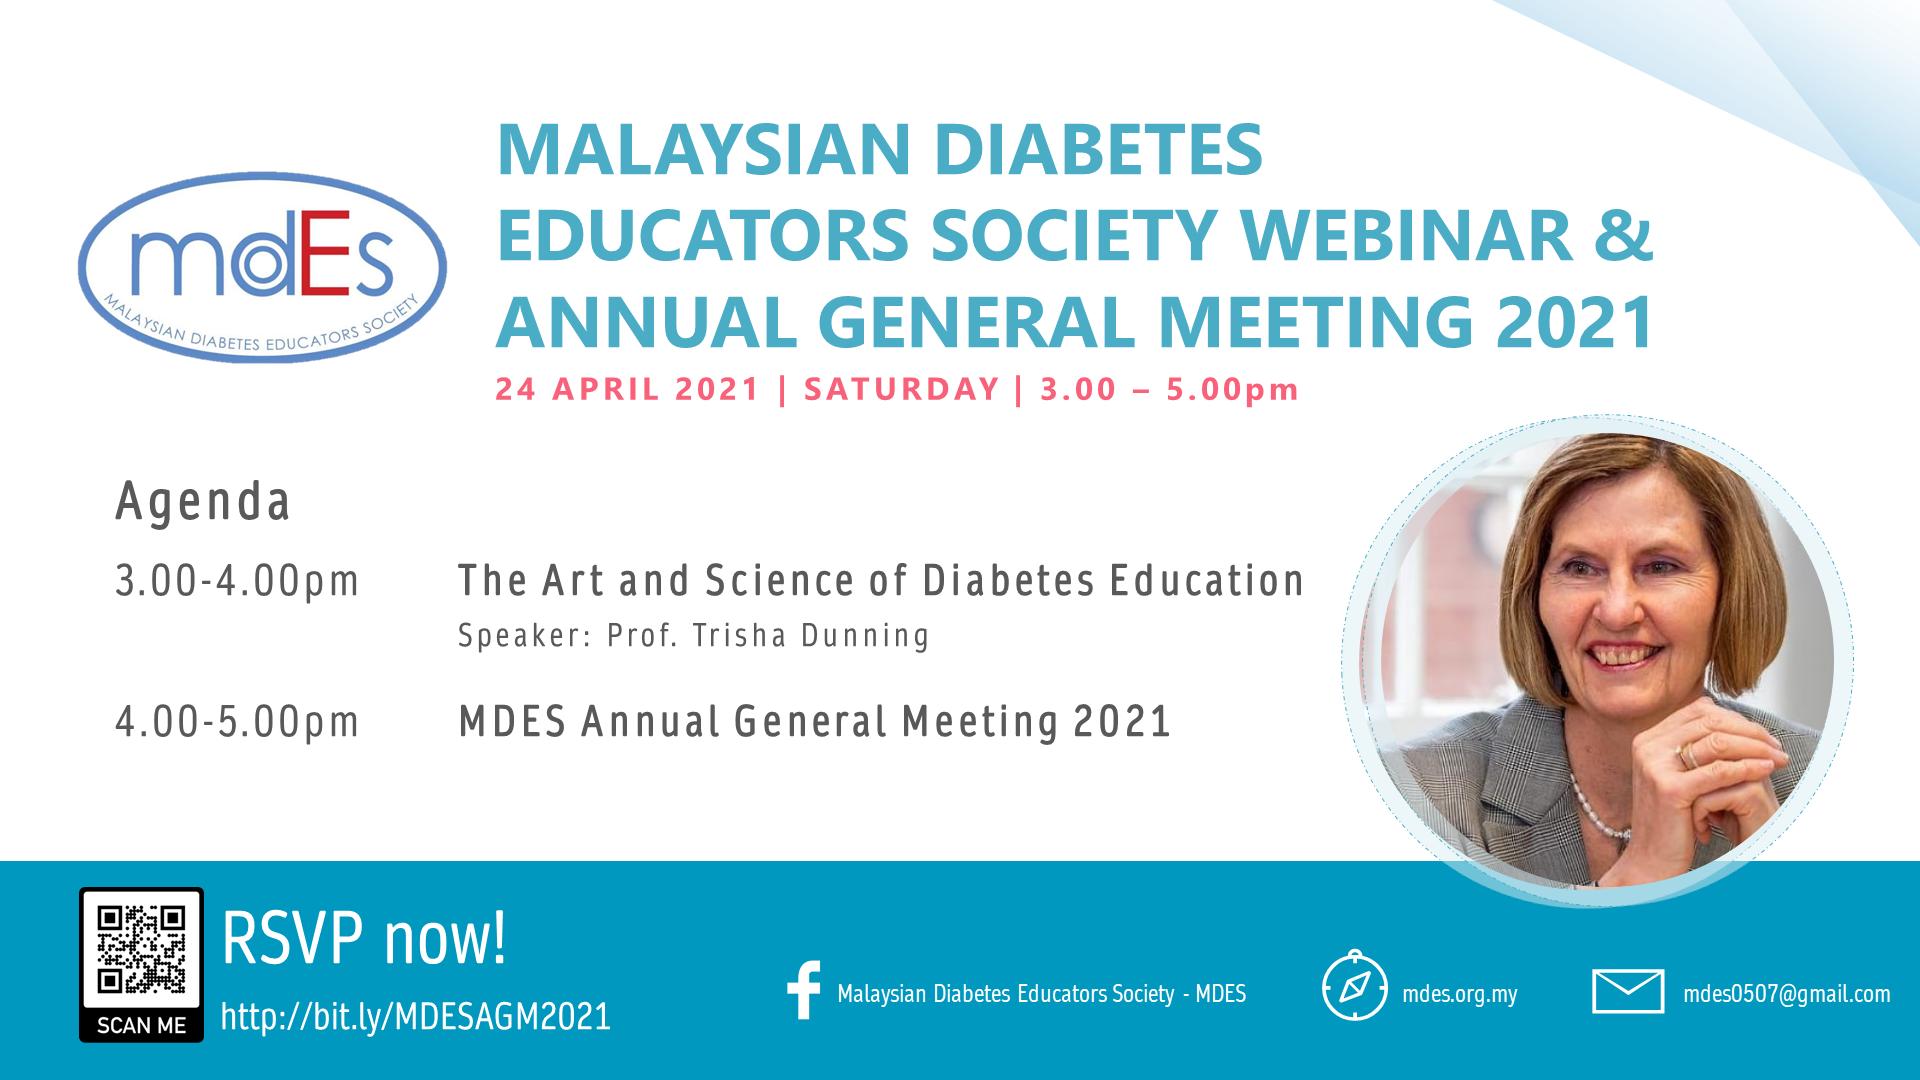 MDES Webinar cum 2021 Annual General Meeting